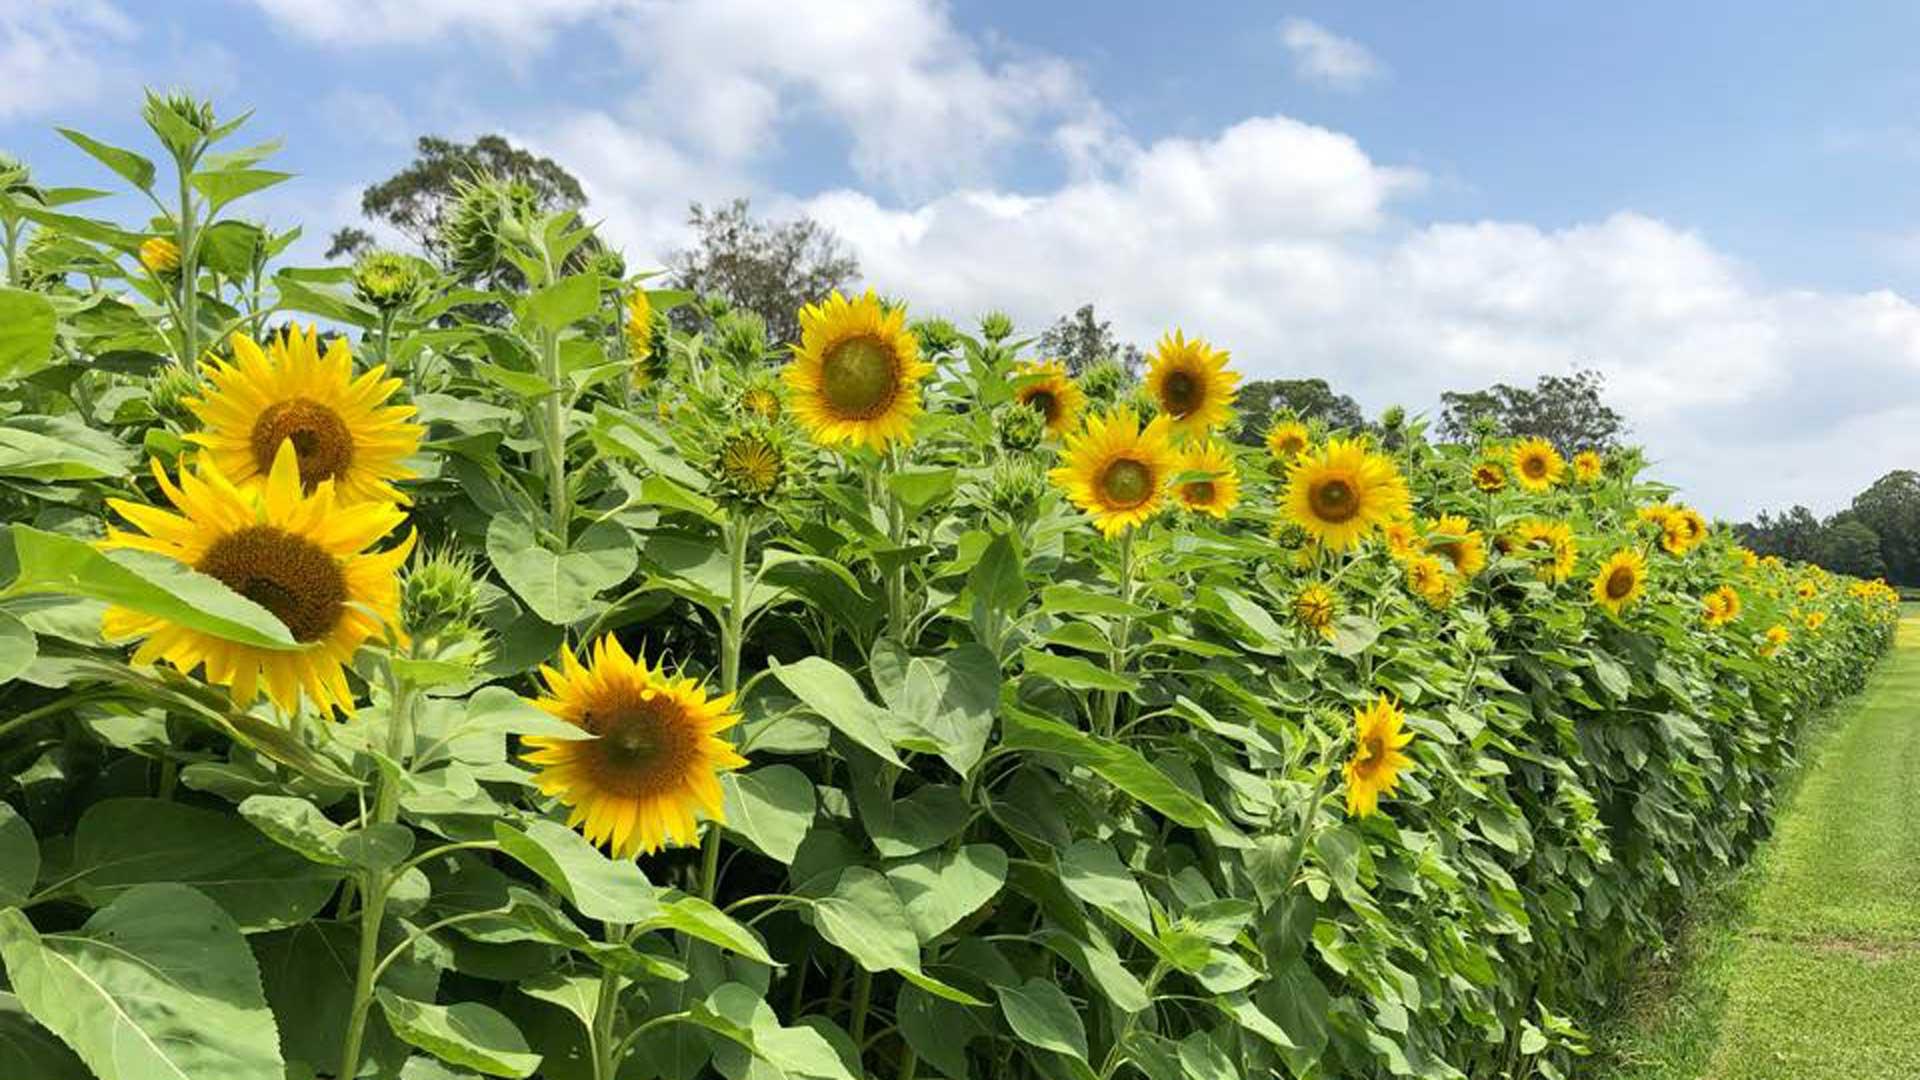 The Central Coast Sunflower Harvest